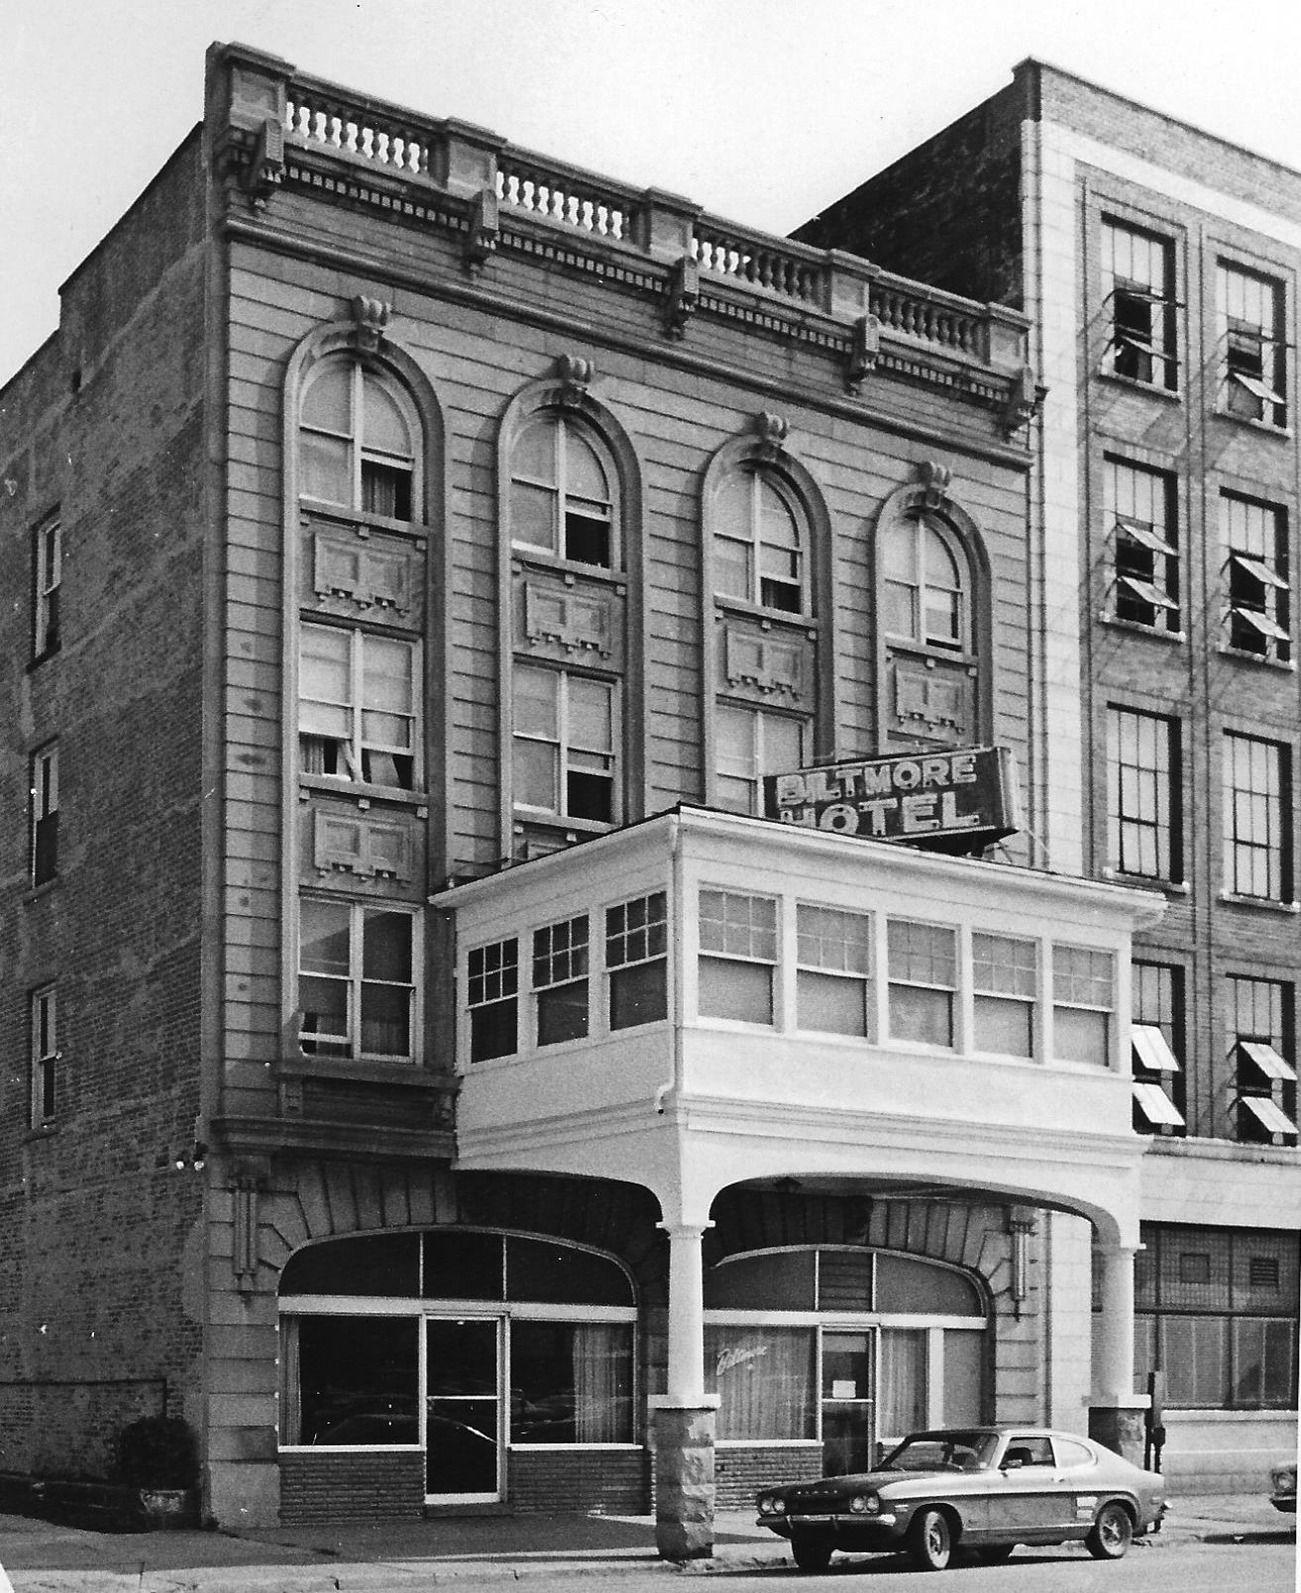 Lost Huntington: The Biltmore Hotel